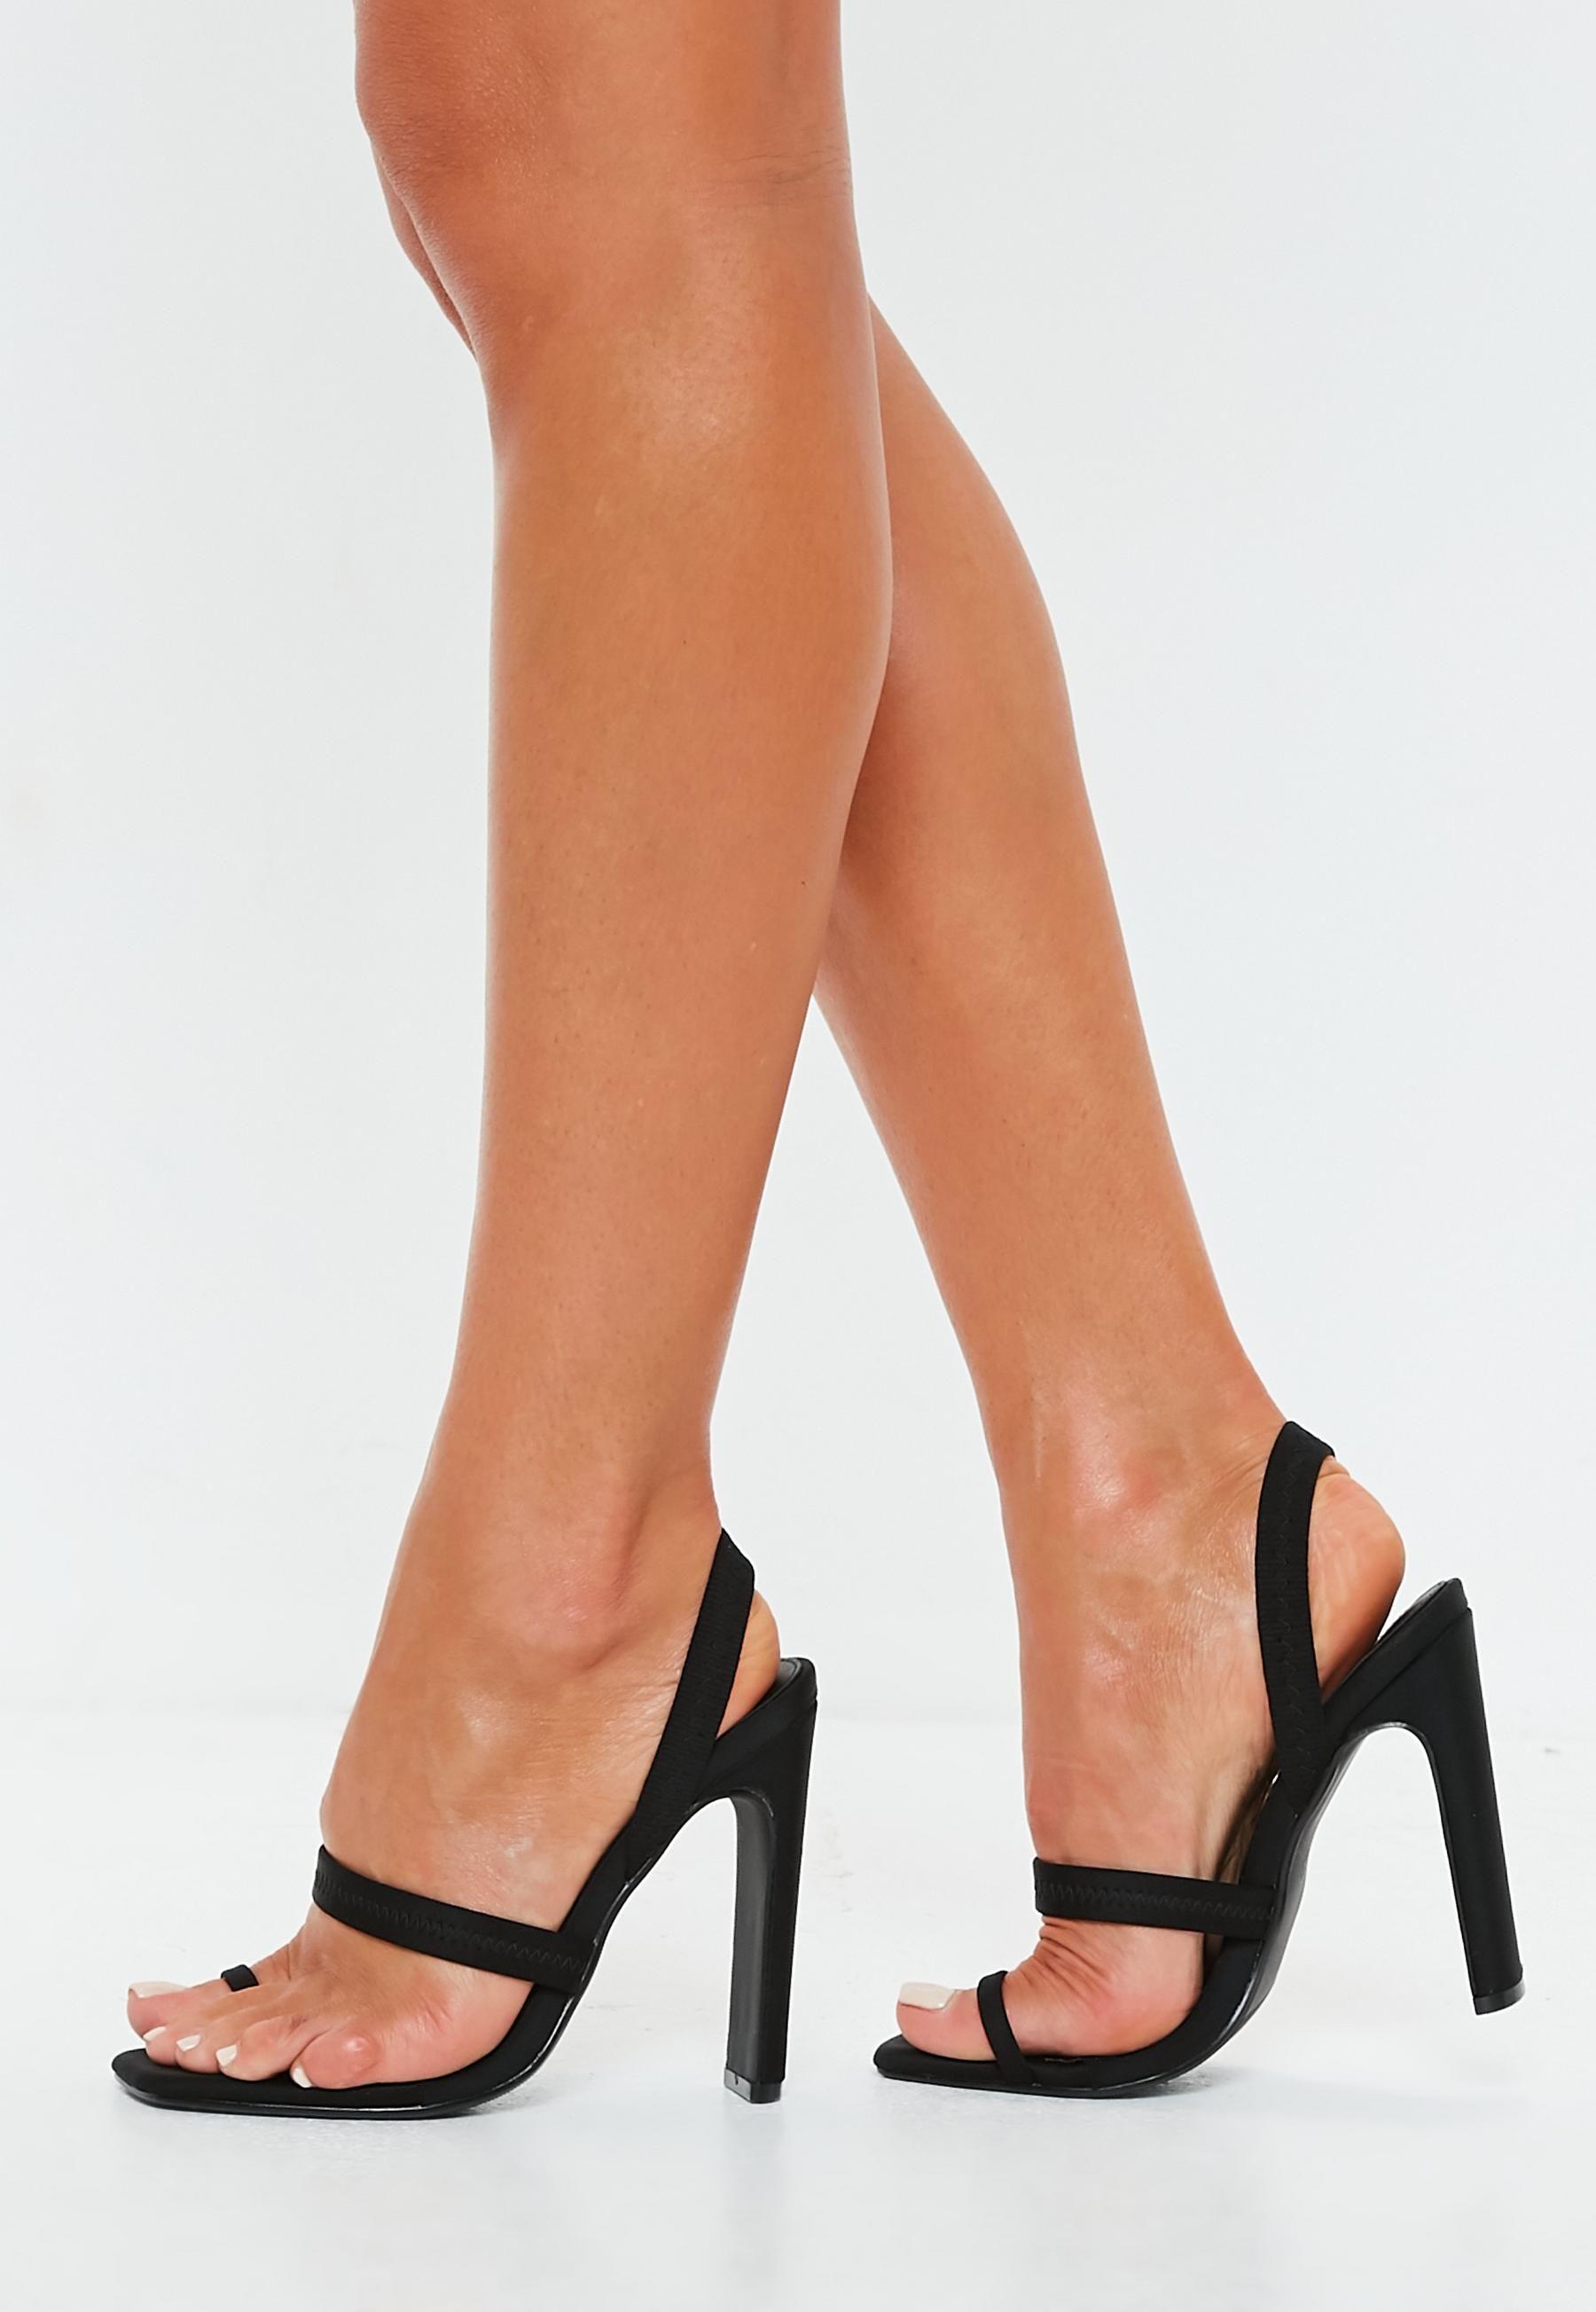 f2b4f91c2c3 Black Toe Post Illusion Slingback Heels